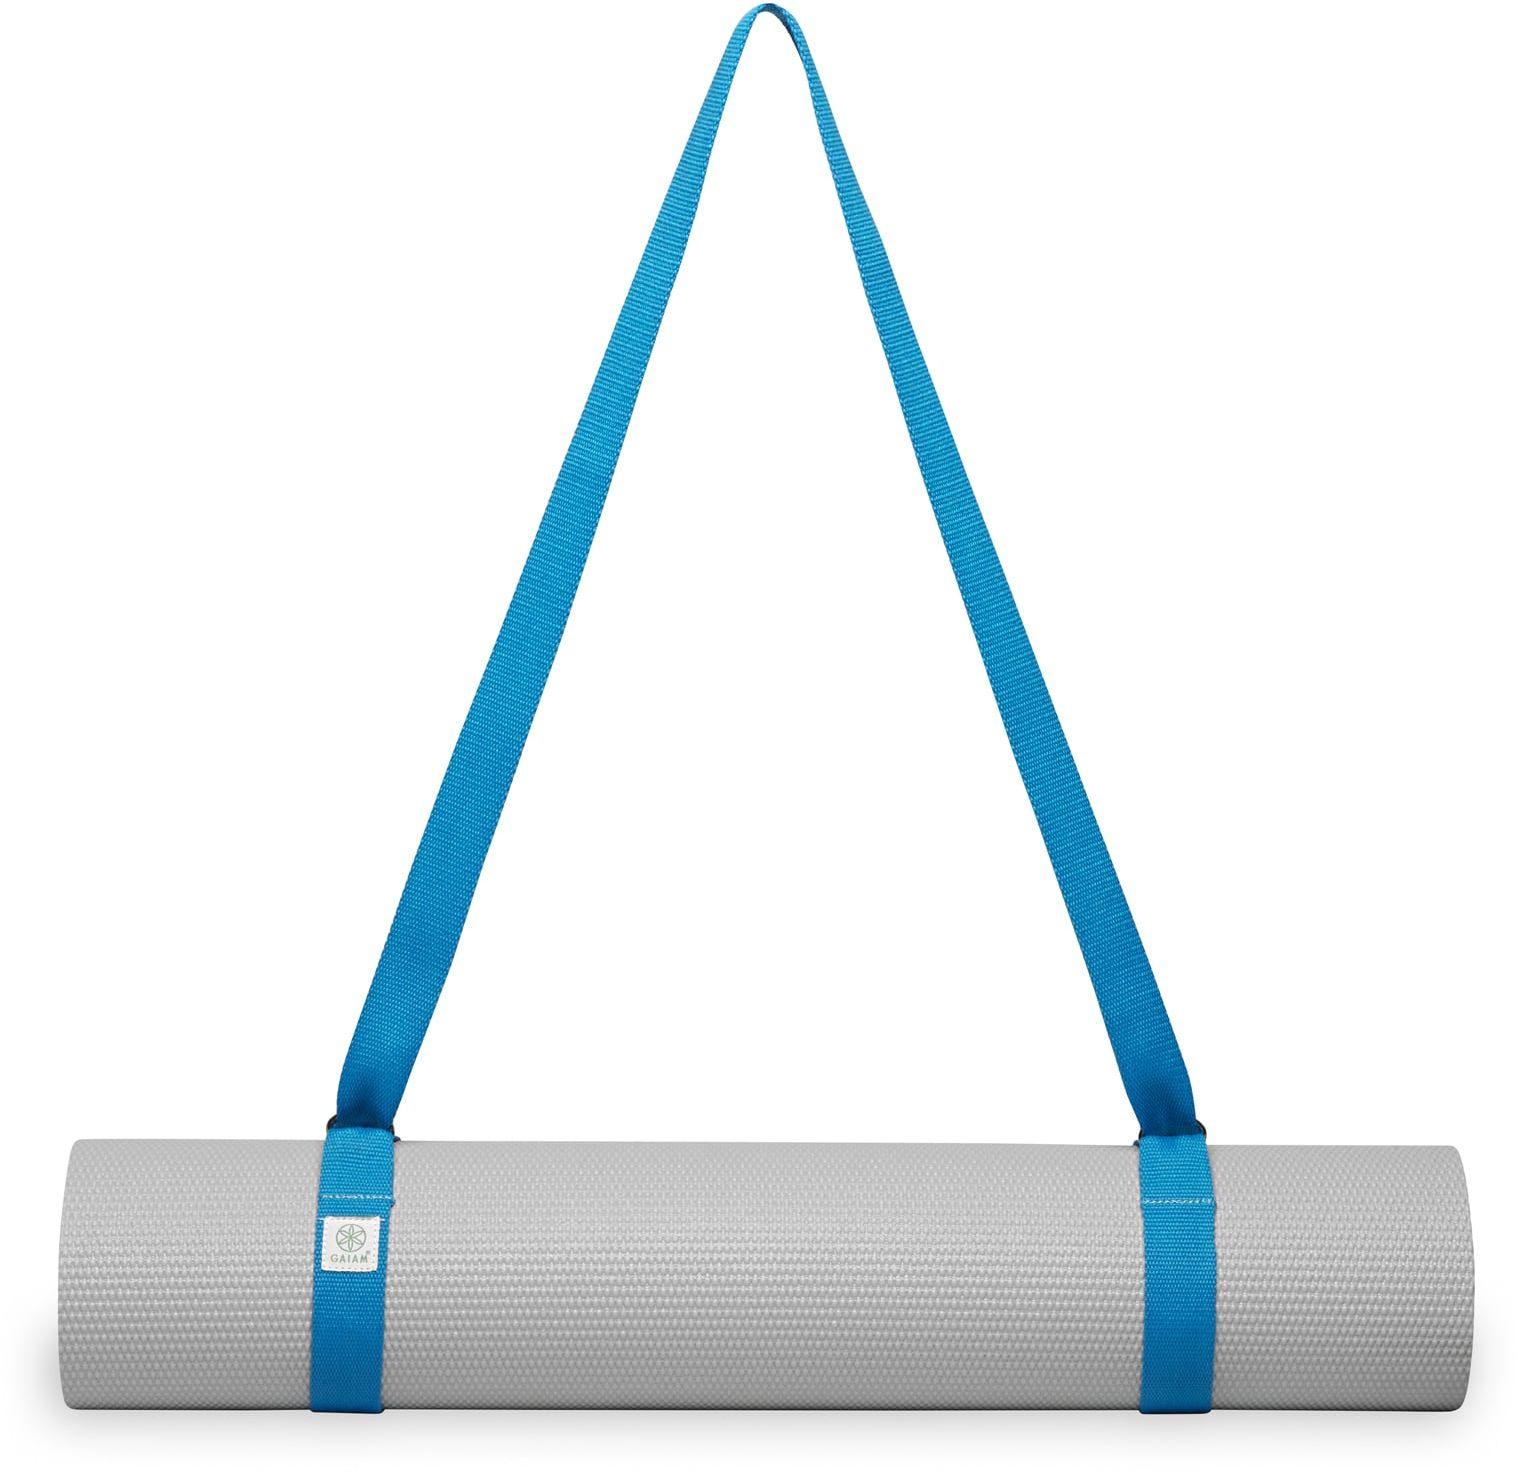 Pasek na matę do jogi niebieski 61711BL GAIAM